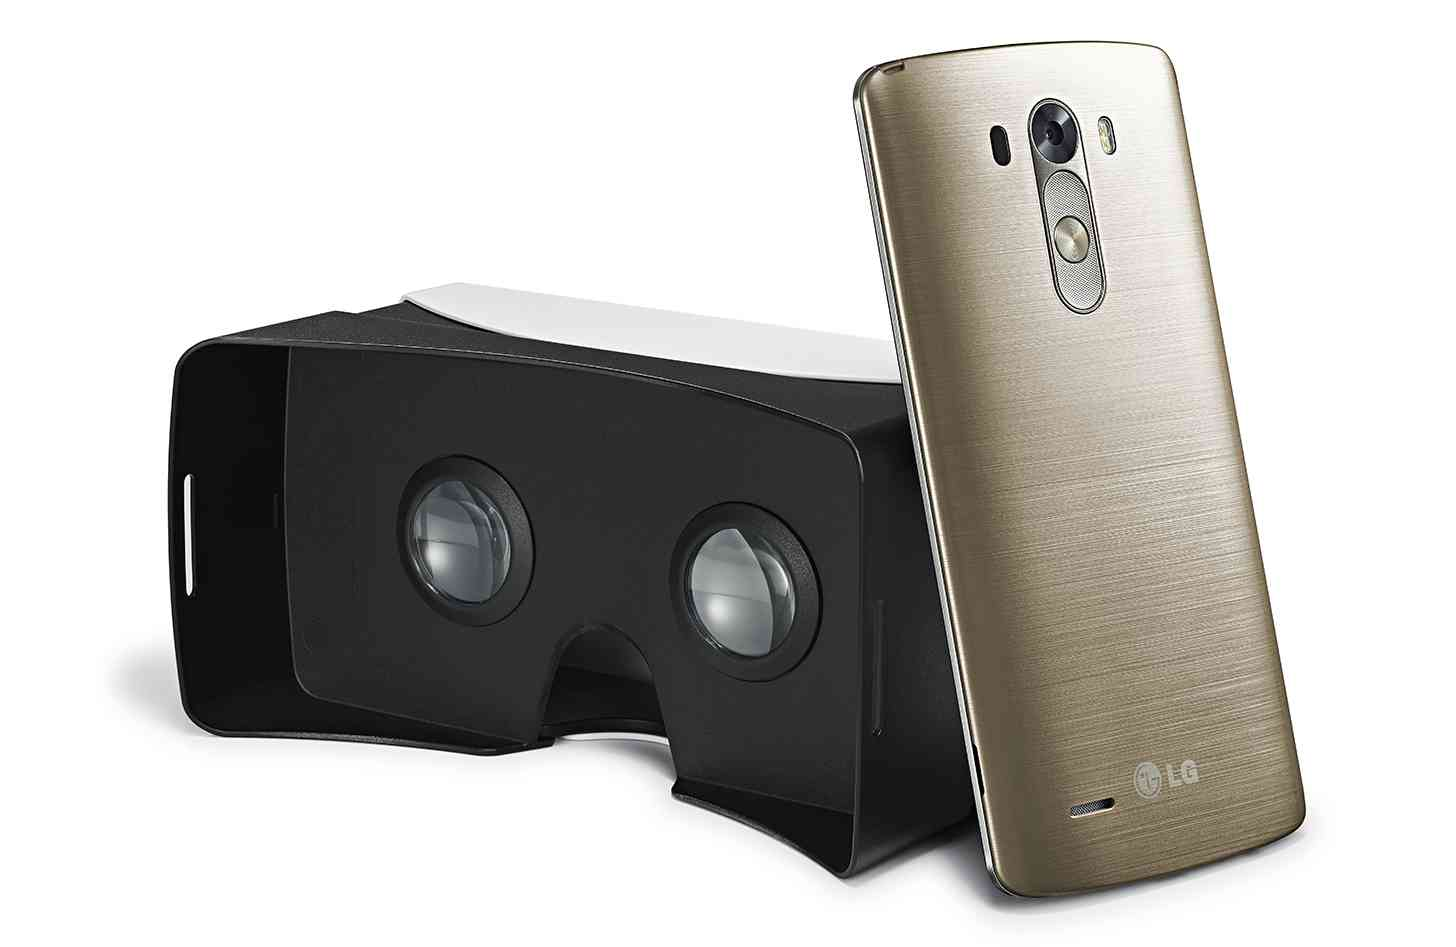 LG G3 VR headset